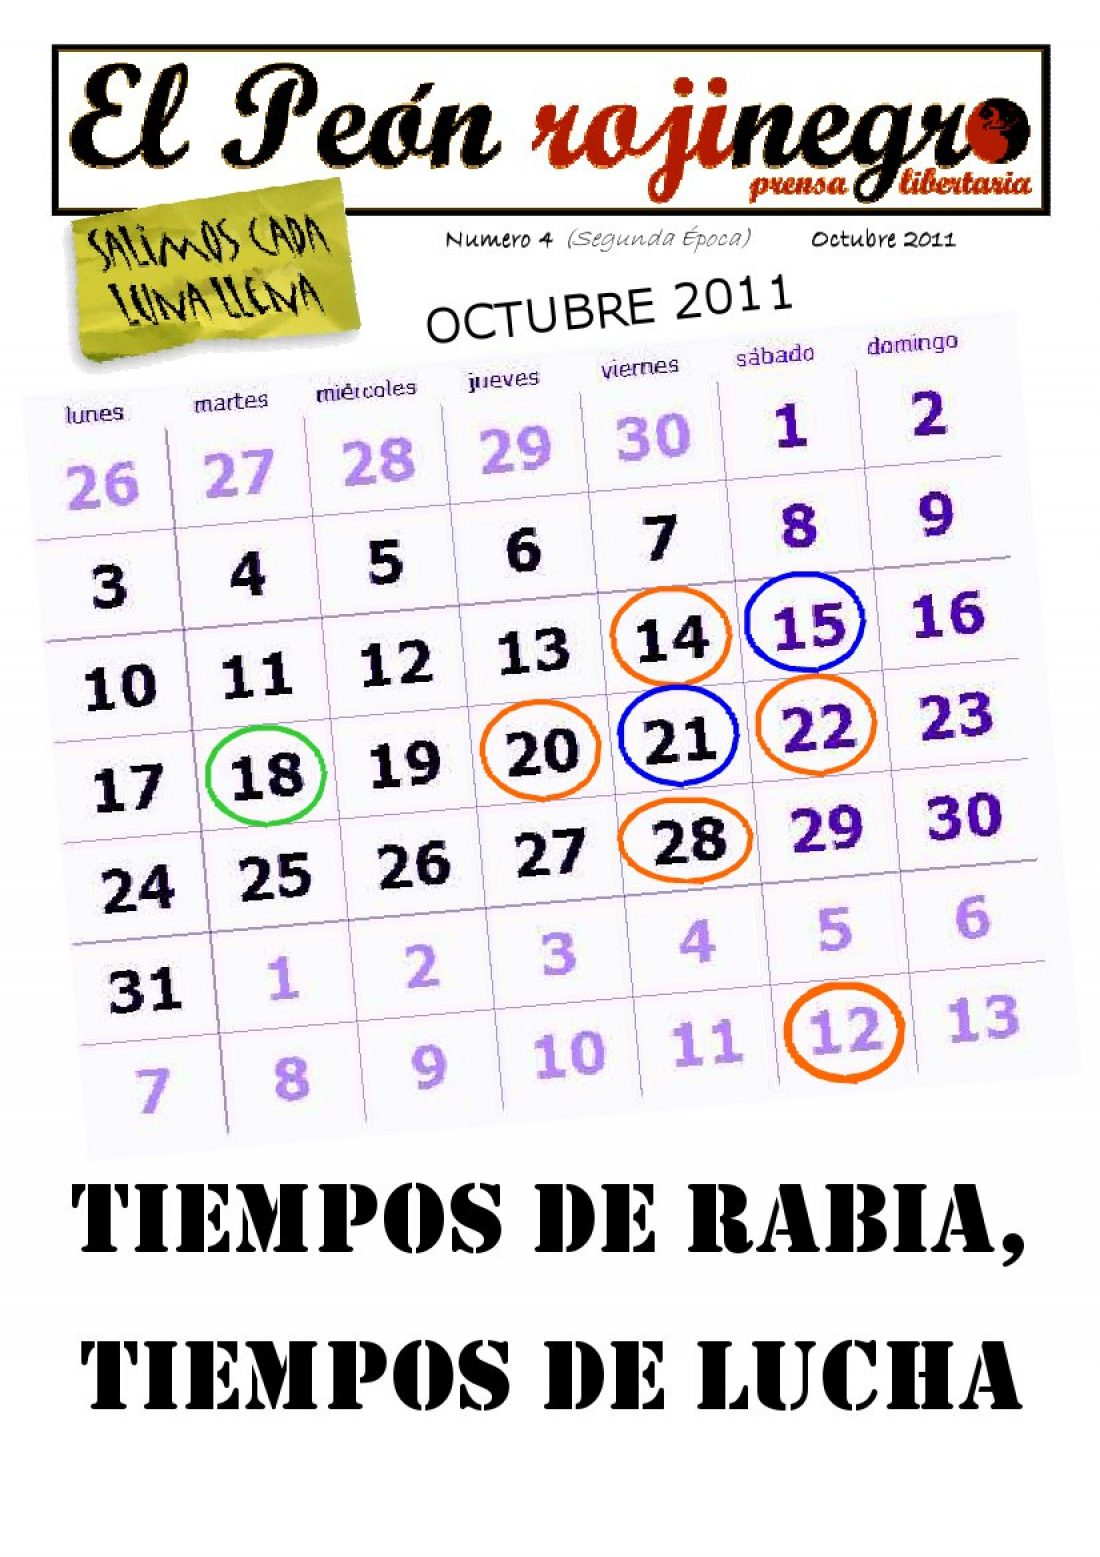 El Peón Rojinegro núm. 4 – Octubre 2011